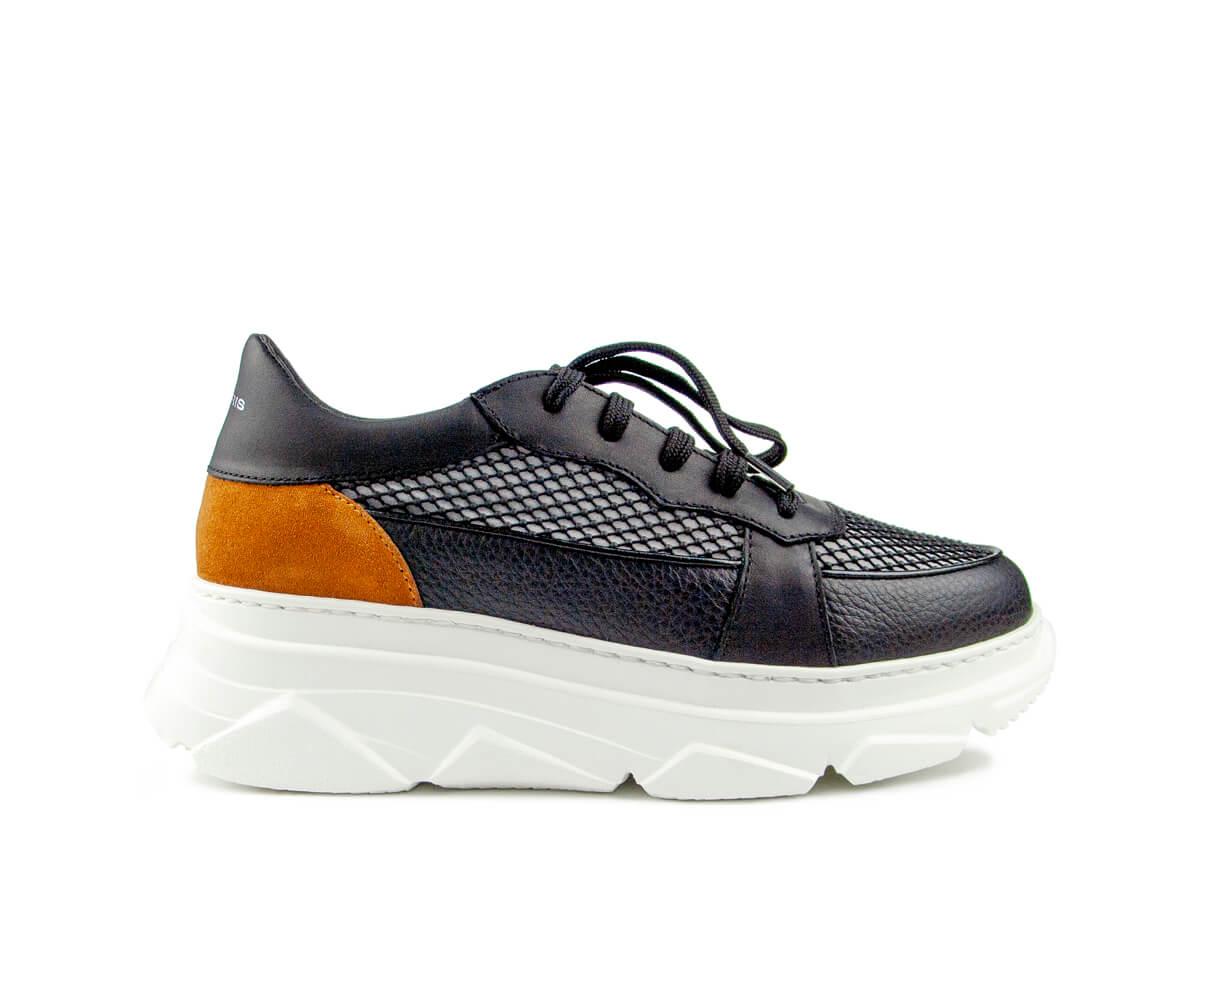 004 ecla scarpe rgb